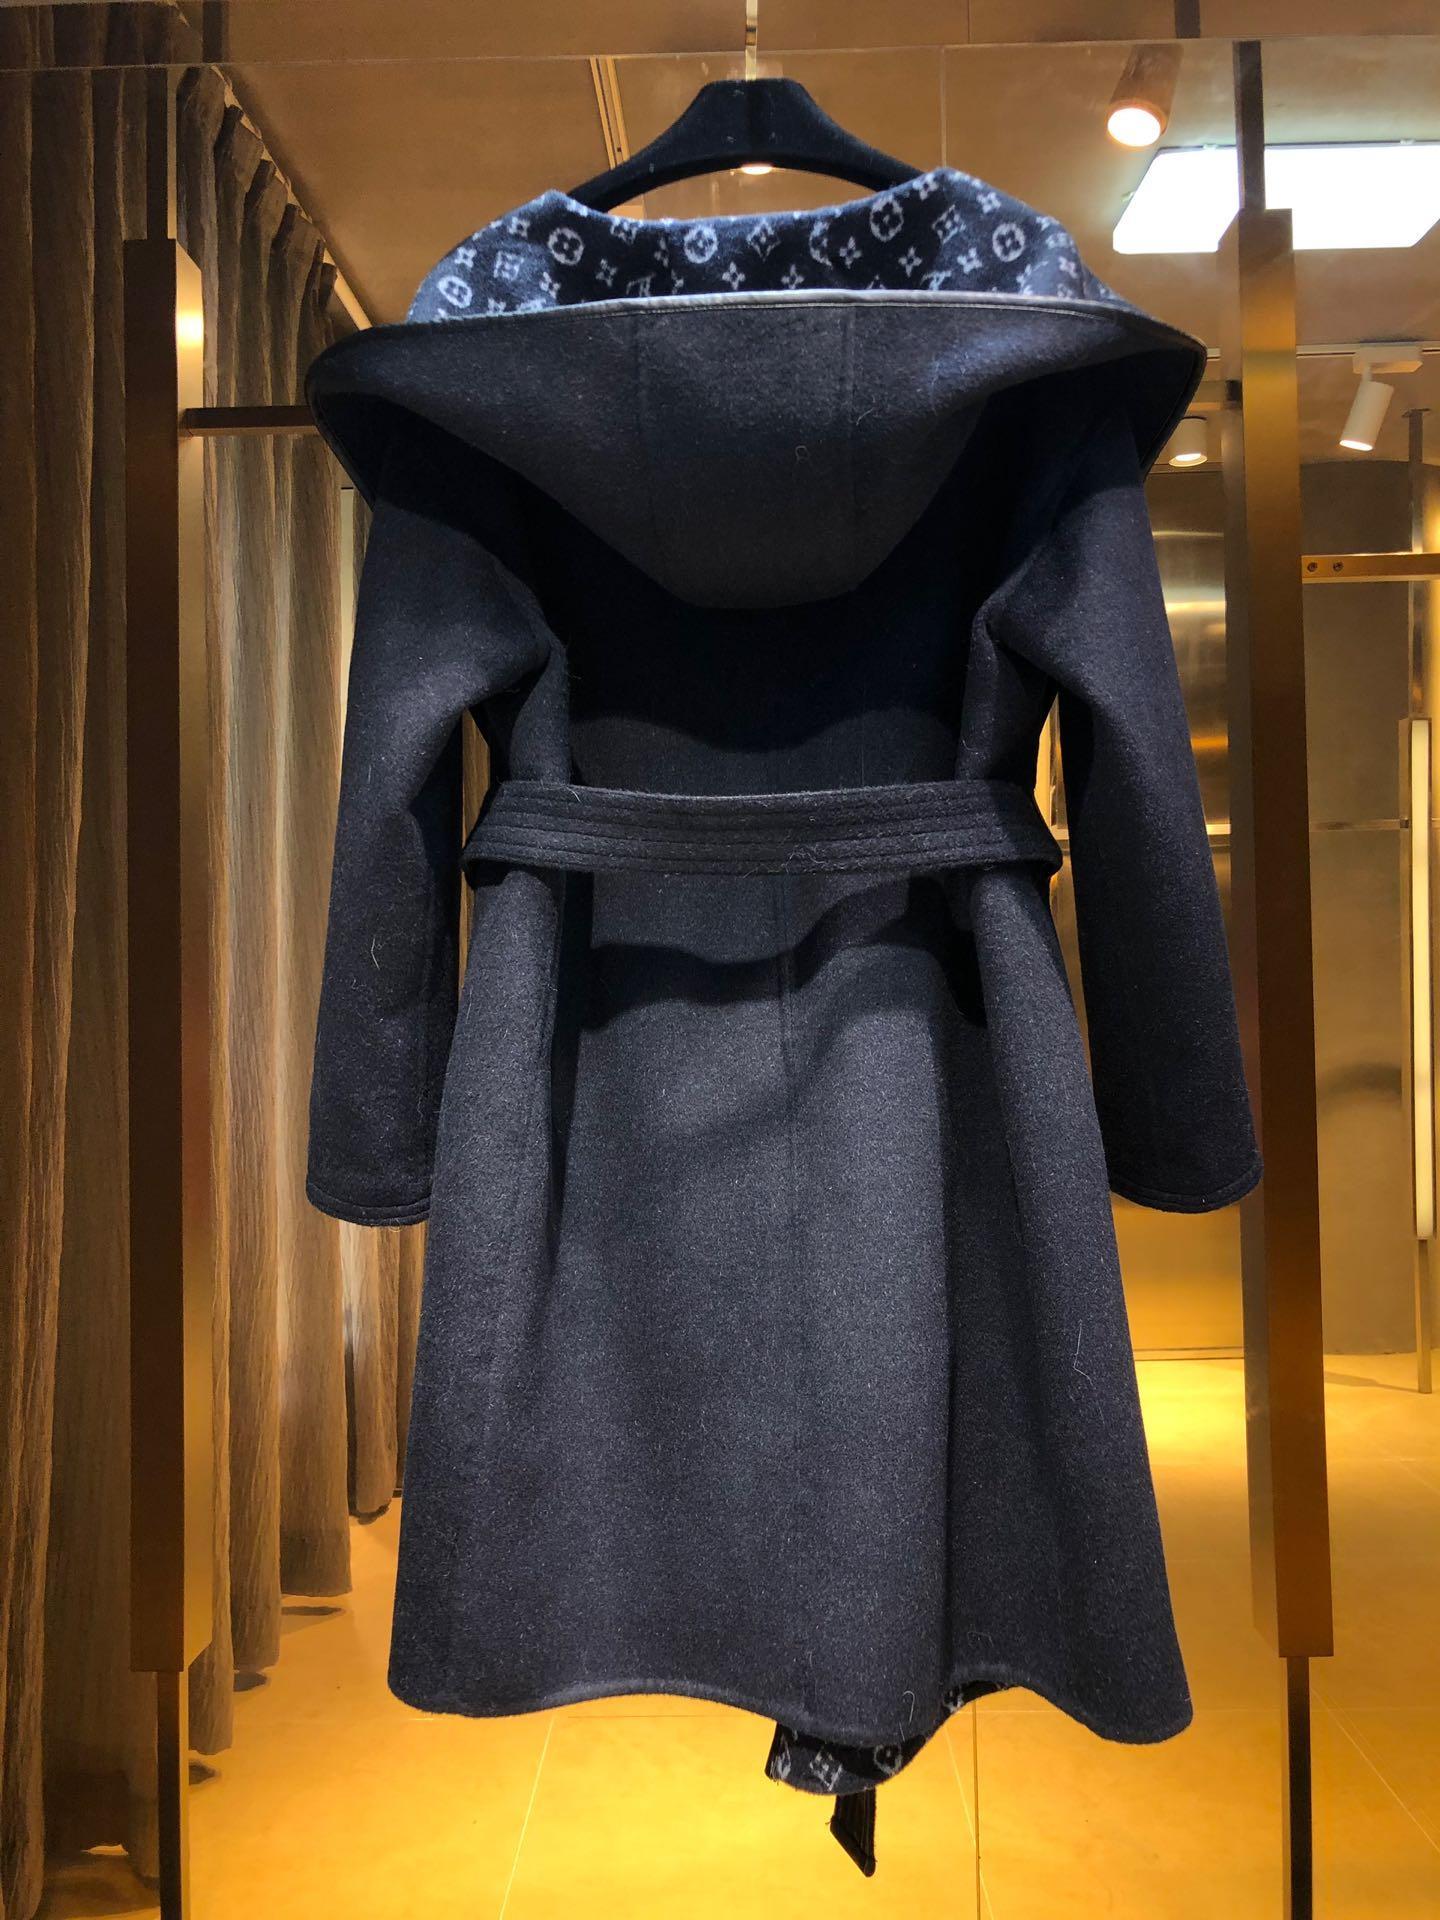 hooded wrap coat    coat 1A4PE7 6